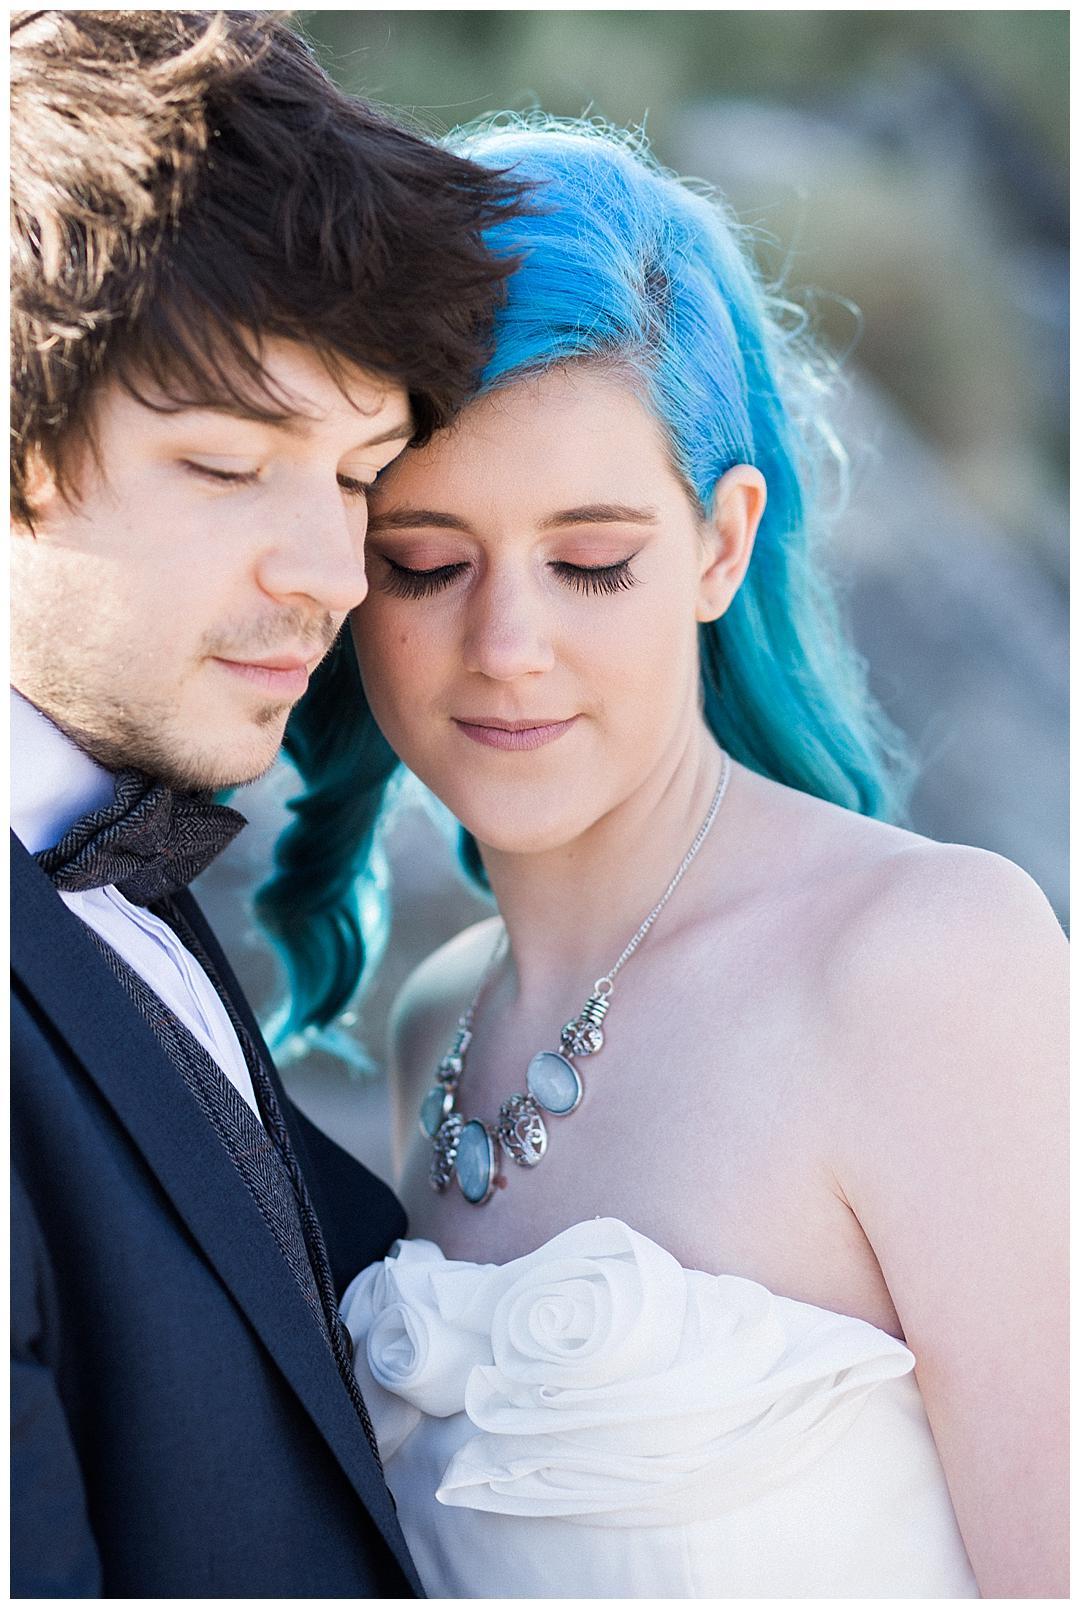 We_can _be_Heroes_alternative_wedding_photographer_Ireland_0066